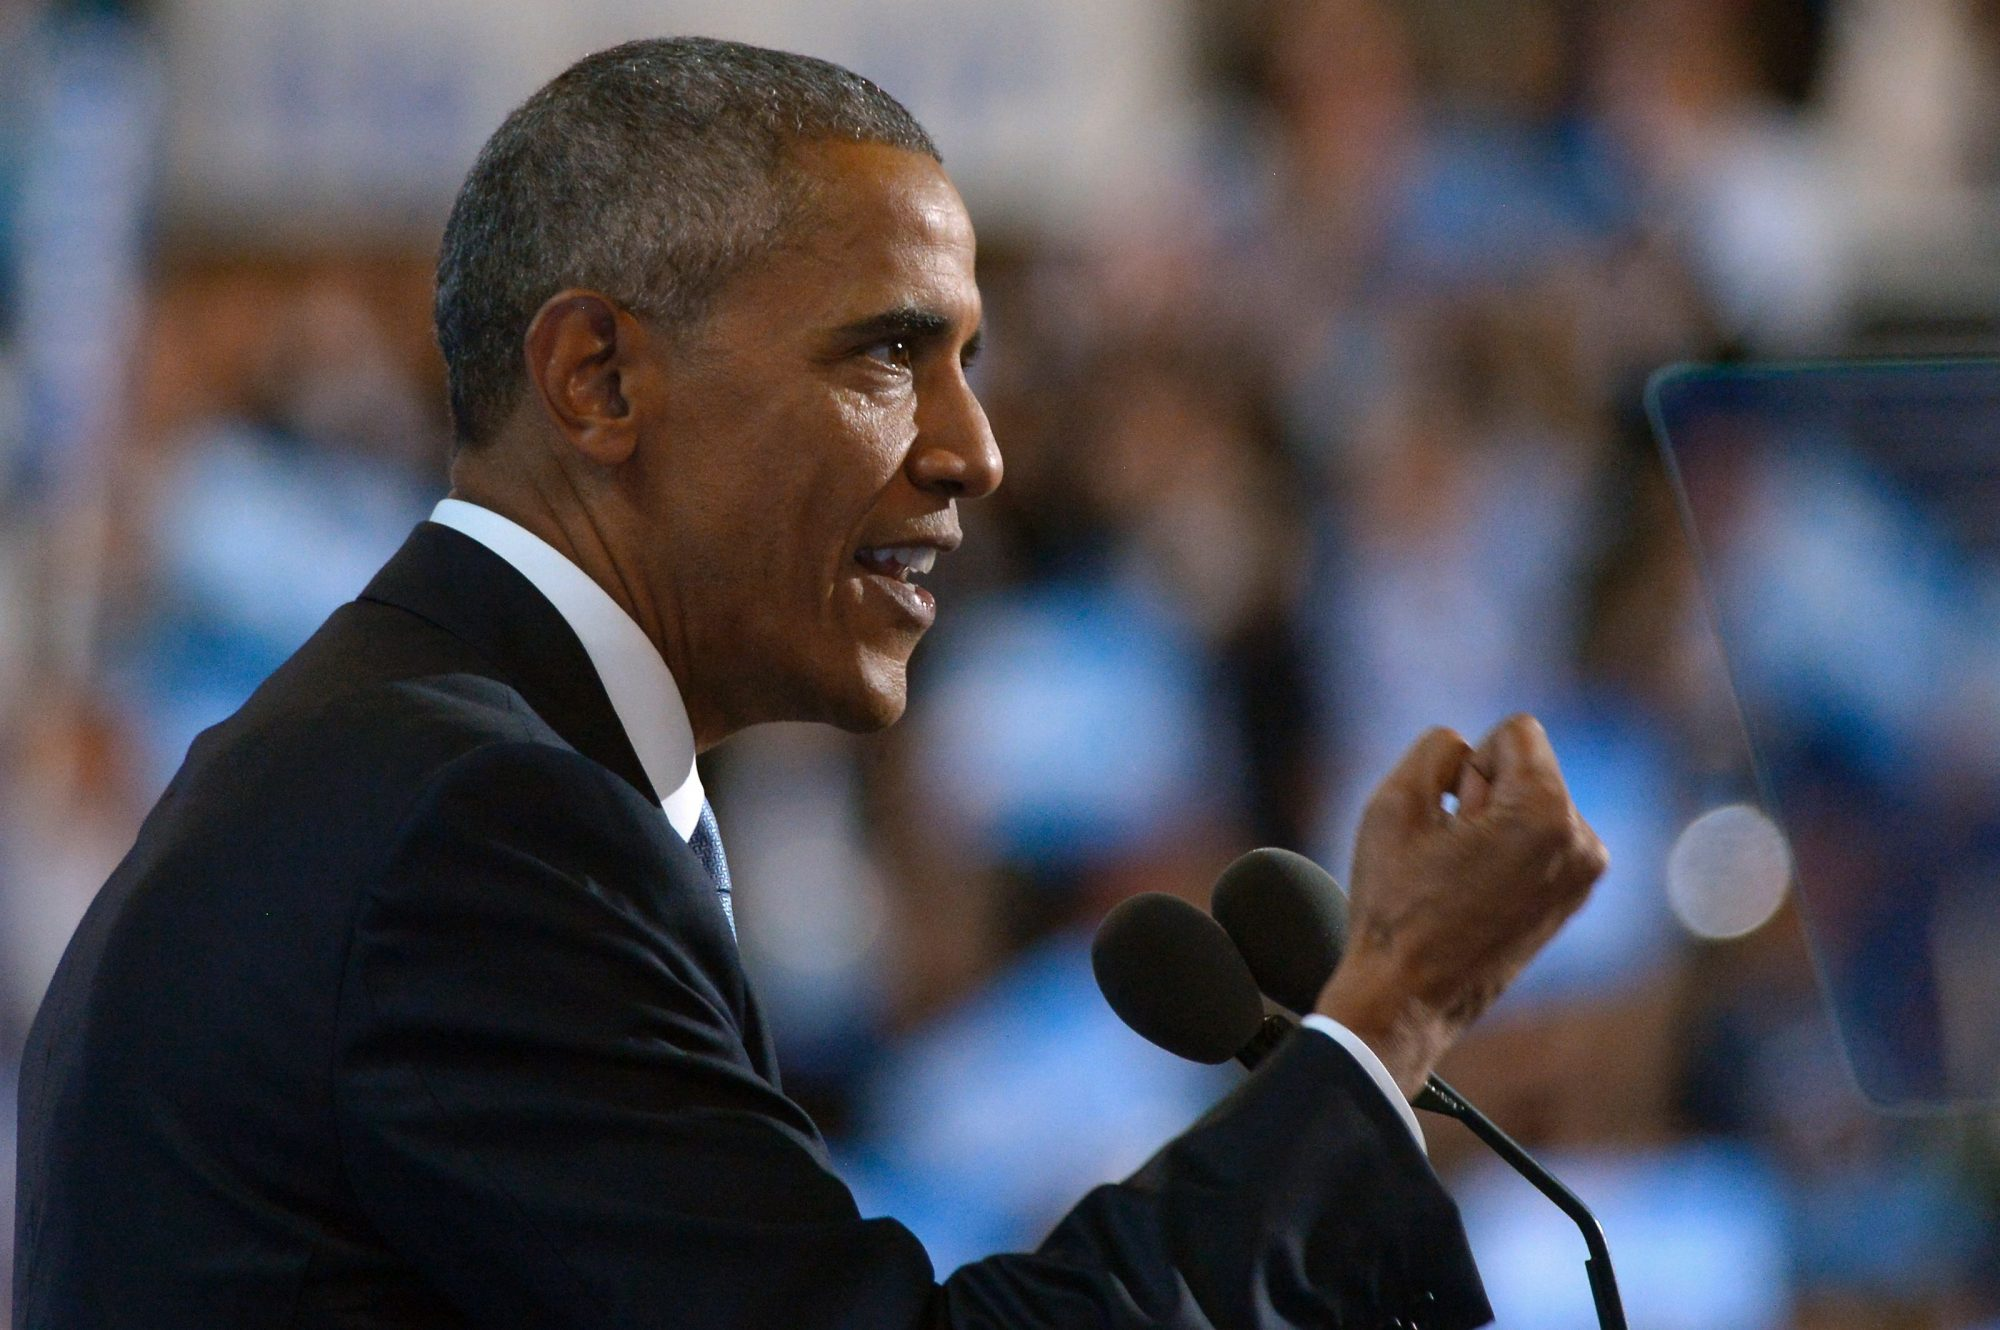 Barack Obama DNC speech